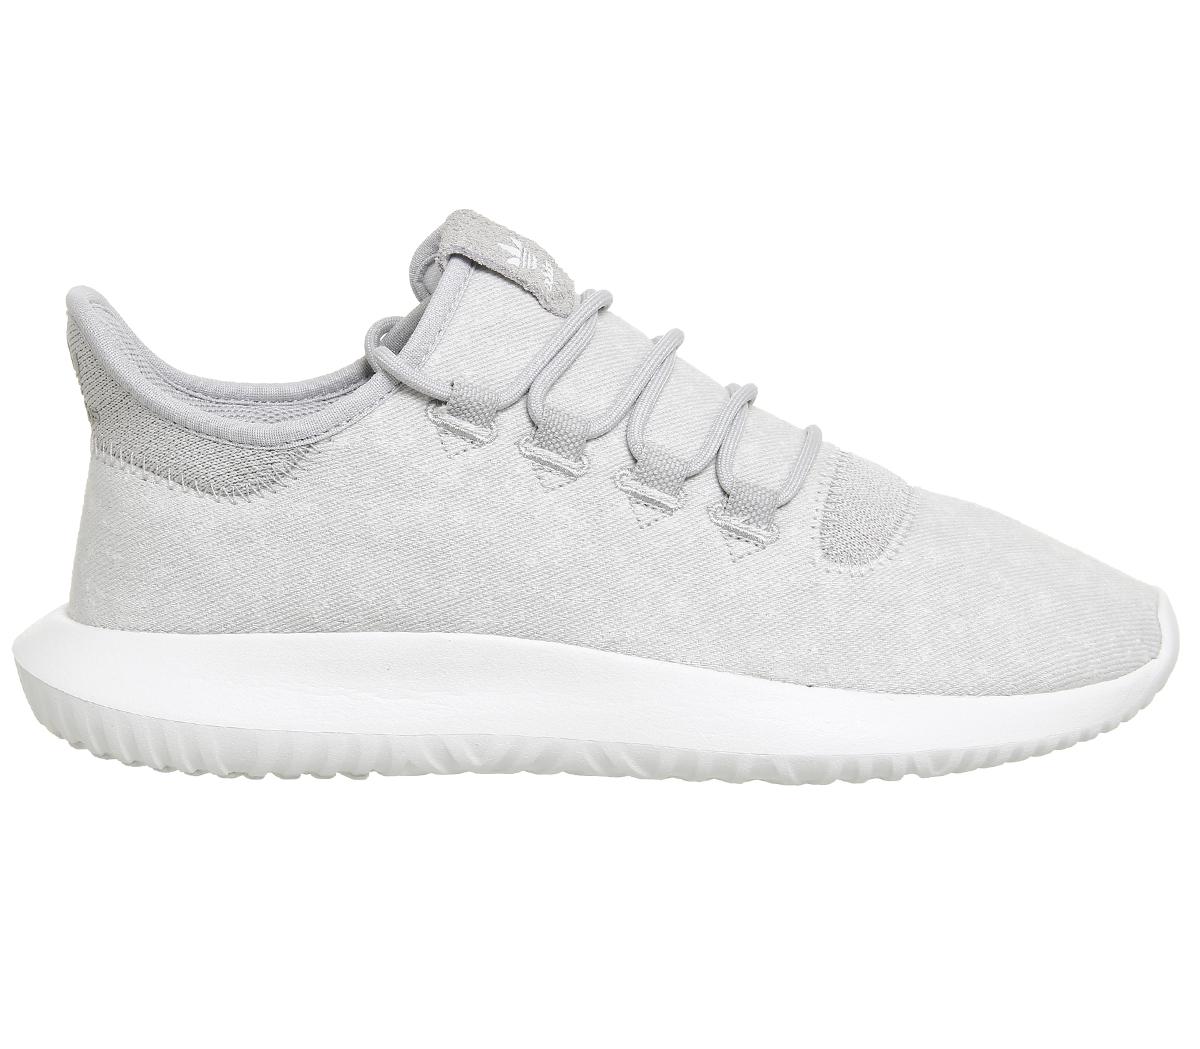 Adidas tubular Shadow GRIS deux Blanc Baskets Chaussures; Photo 2/7 ...